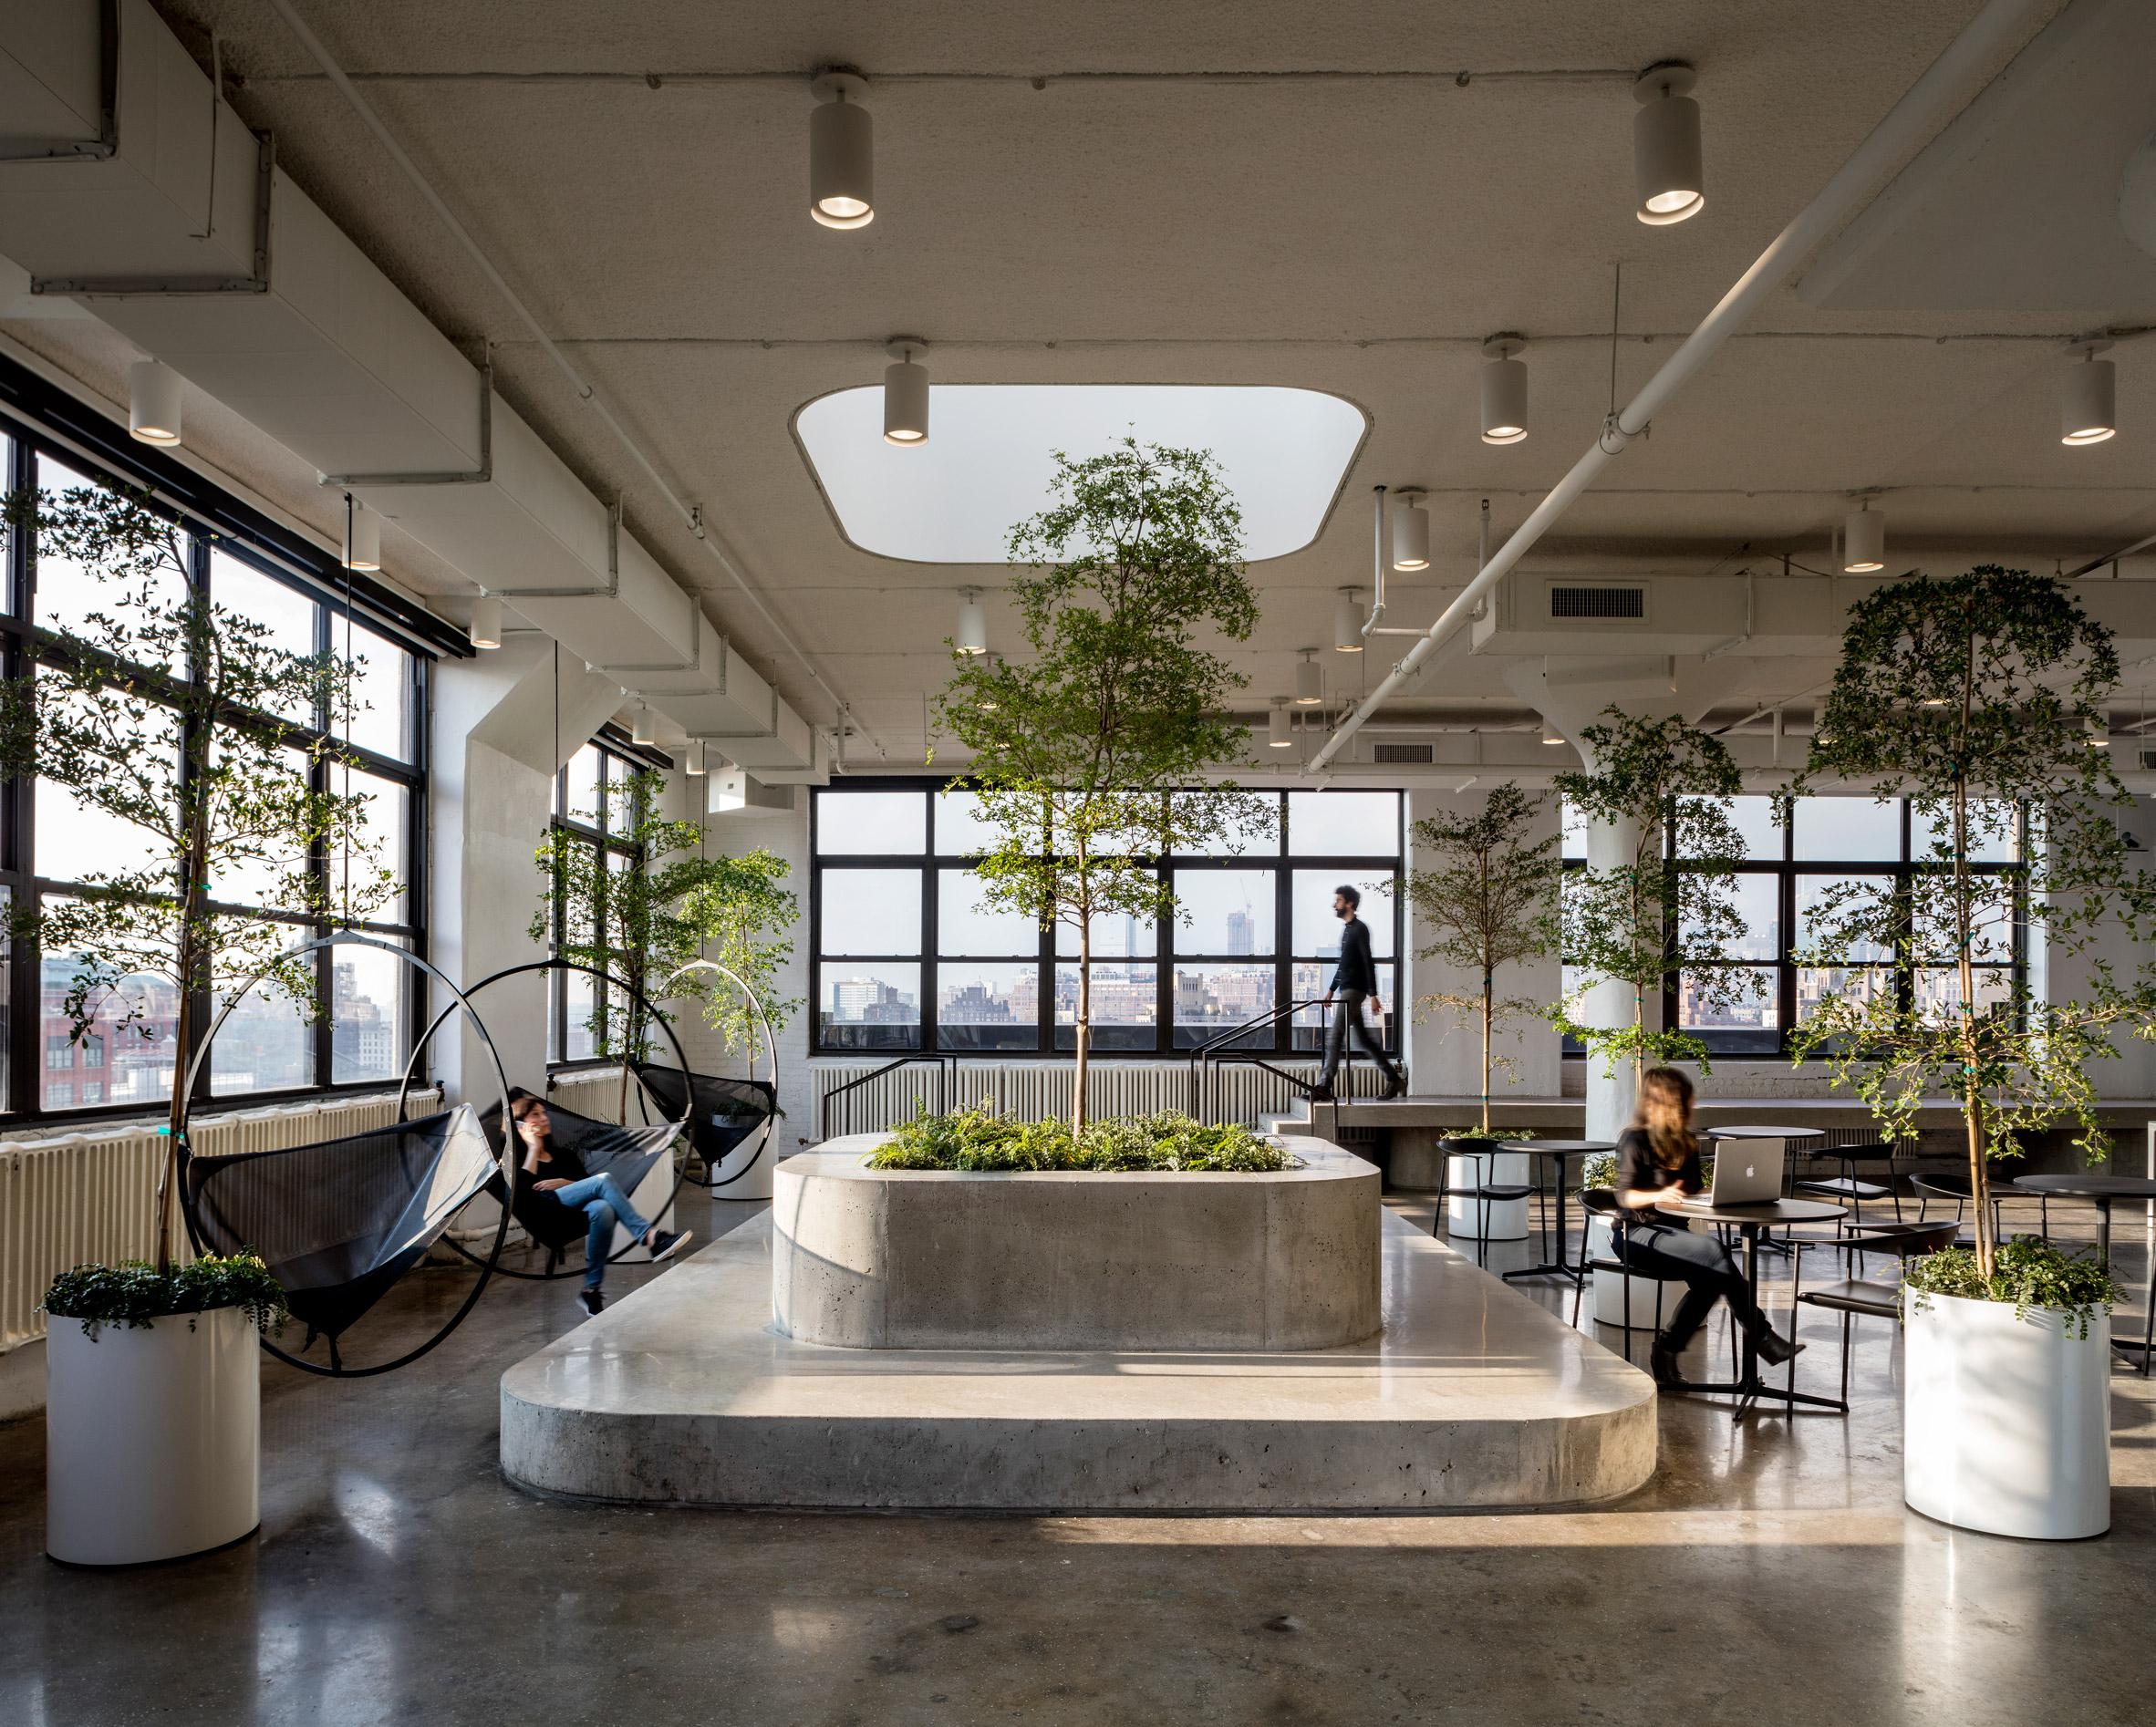 squarespace-offices-interior-design-print-shop-conversion-aplusi-a-and-i-new-york-usa_dezeen_2364_col_14